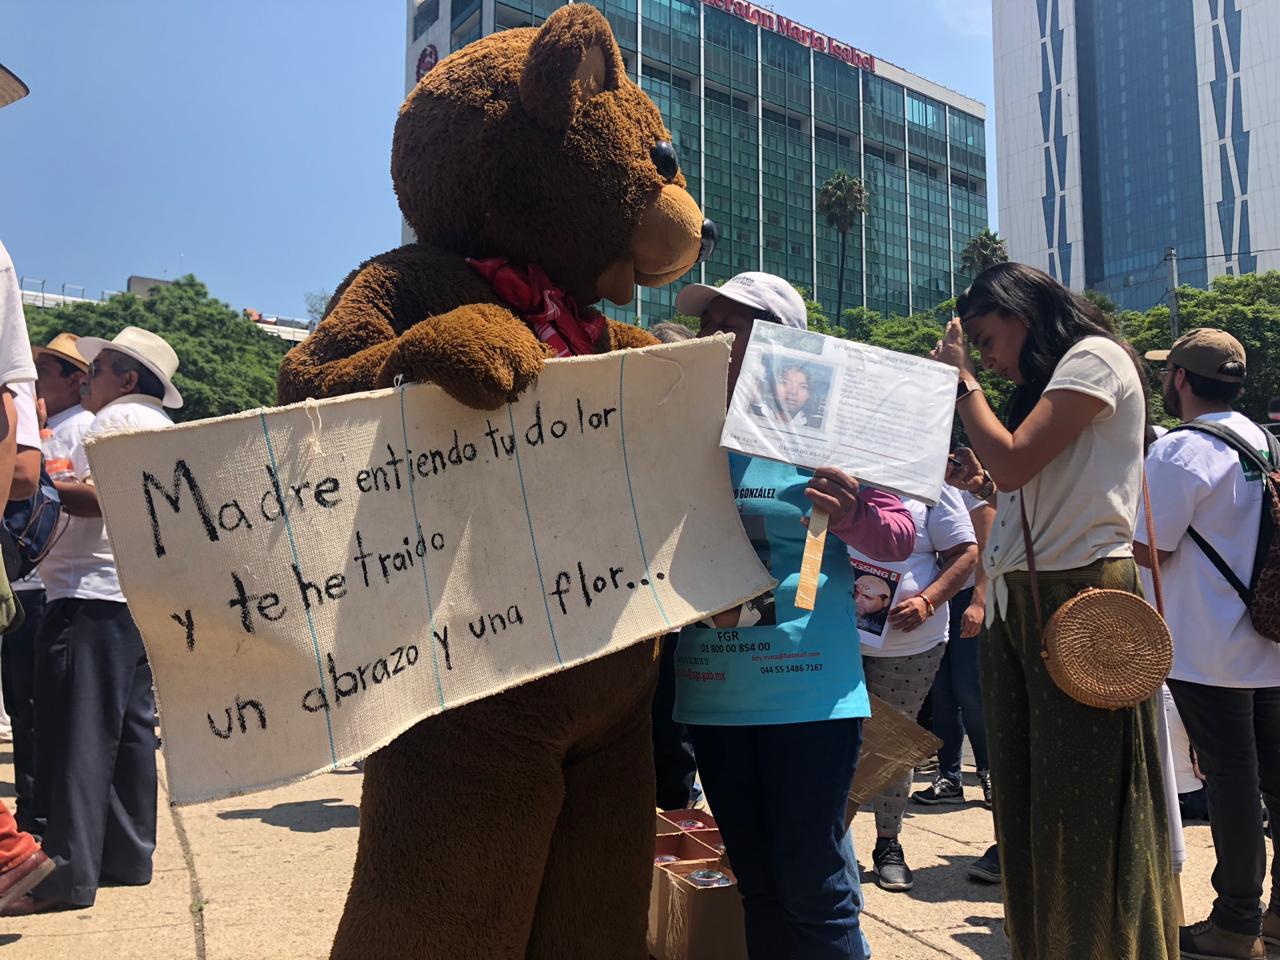 Mamás-desaparecidos-manifestación-2019